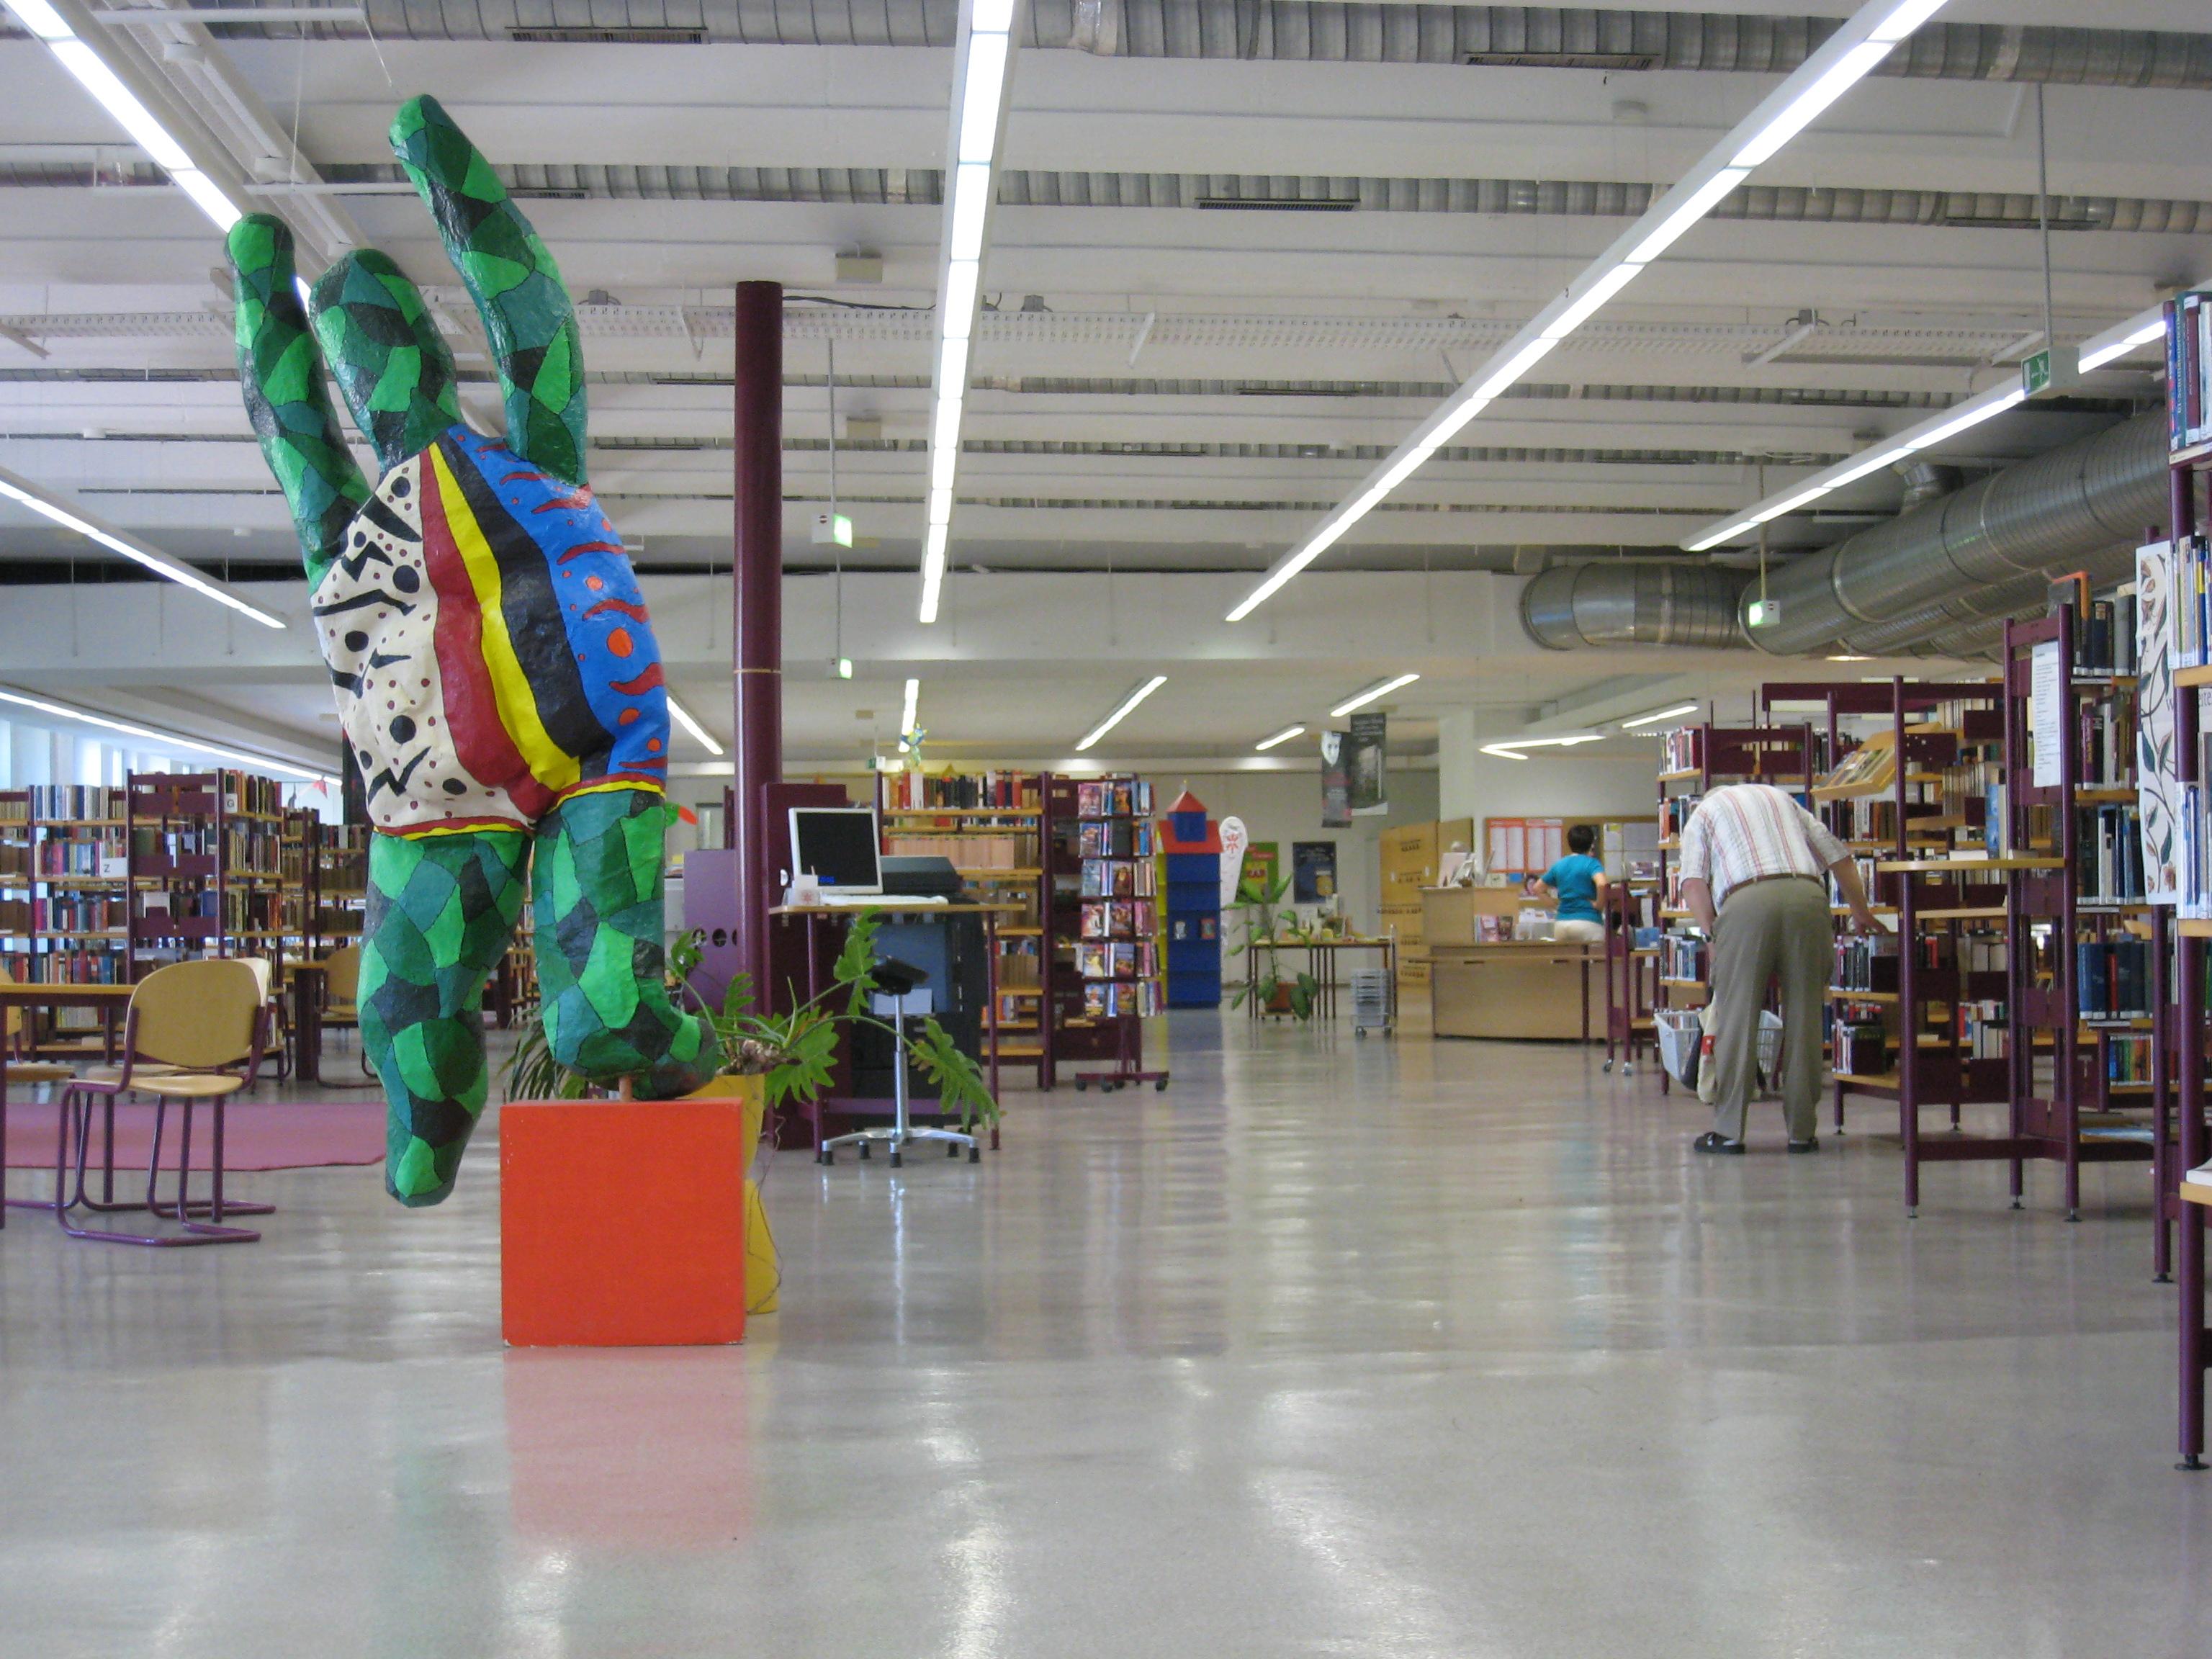 datei public library berliner platz erfurt interior jpg wikipedia. Black Bedroom Furniture Sets. Home Design Ideas